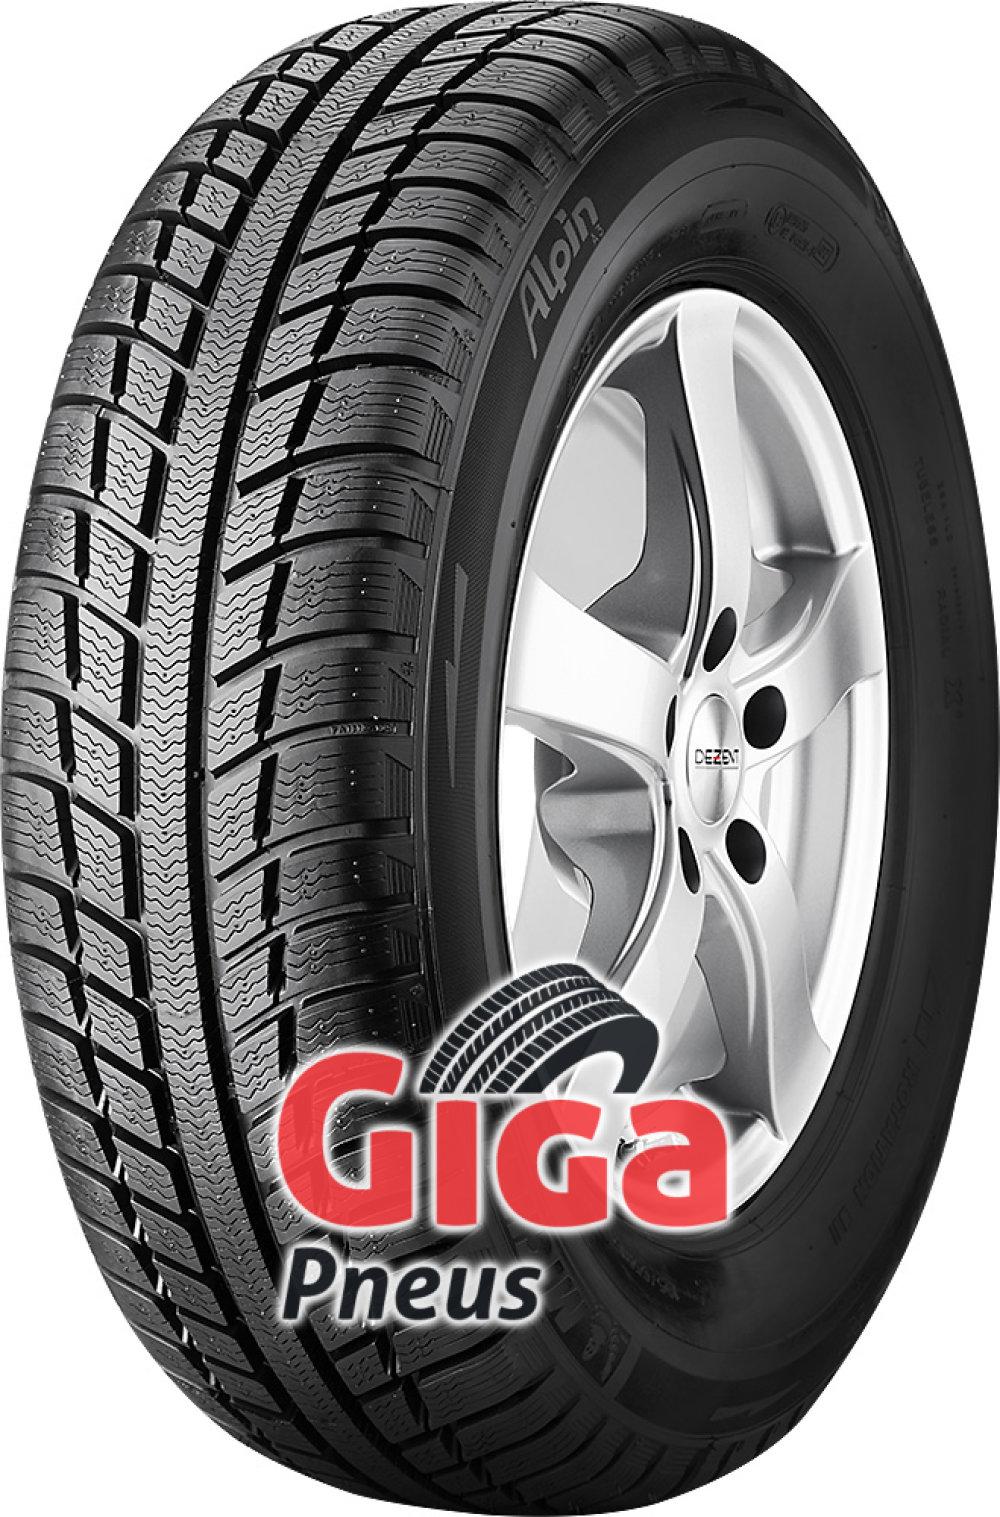 Michelin Alpin A3 ( 185/70 R14 88T GRNX )